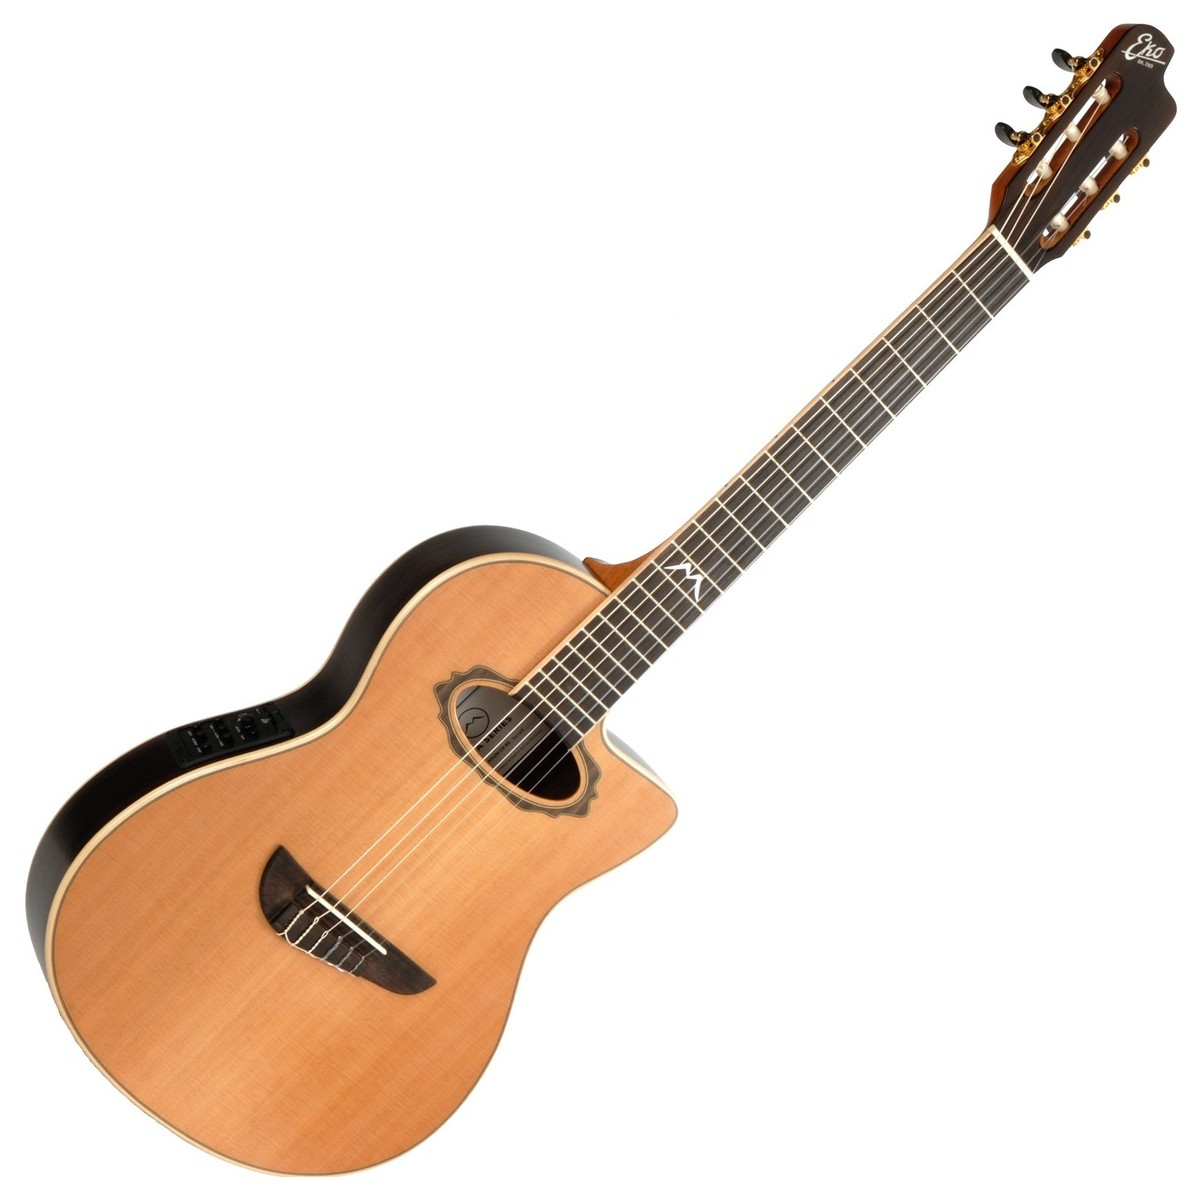 eko mia nylon cw eq guitare electro acoustique naturel. Black Bedroom Furniture Sets. Home Design Ideas